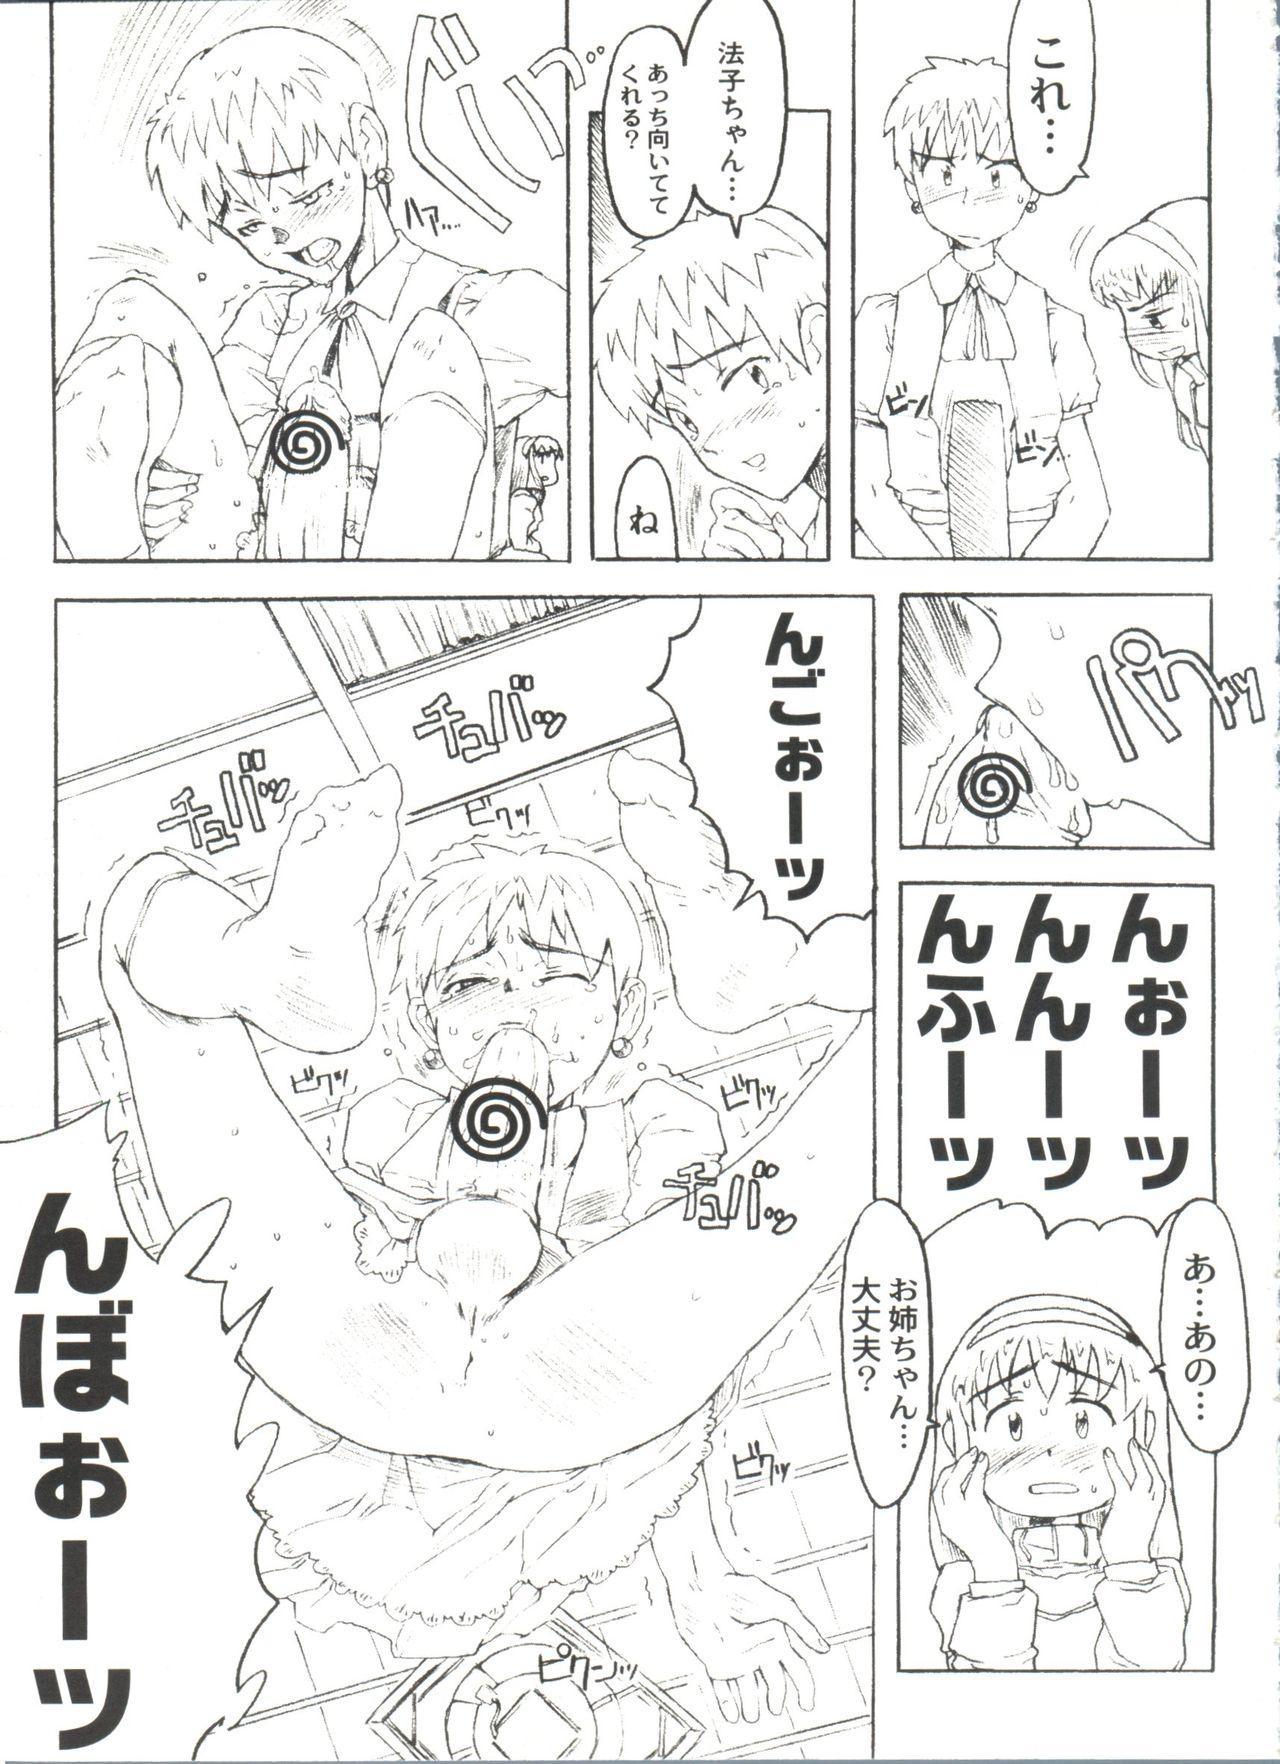 [Anthology] Denei Tamatebako 8 - Utakata no Tenshi-tachi II (Various) 80